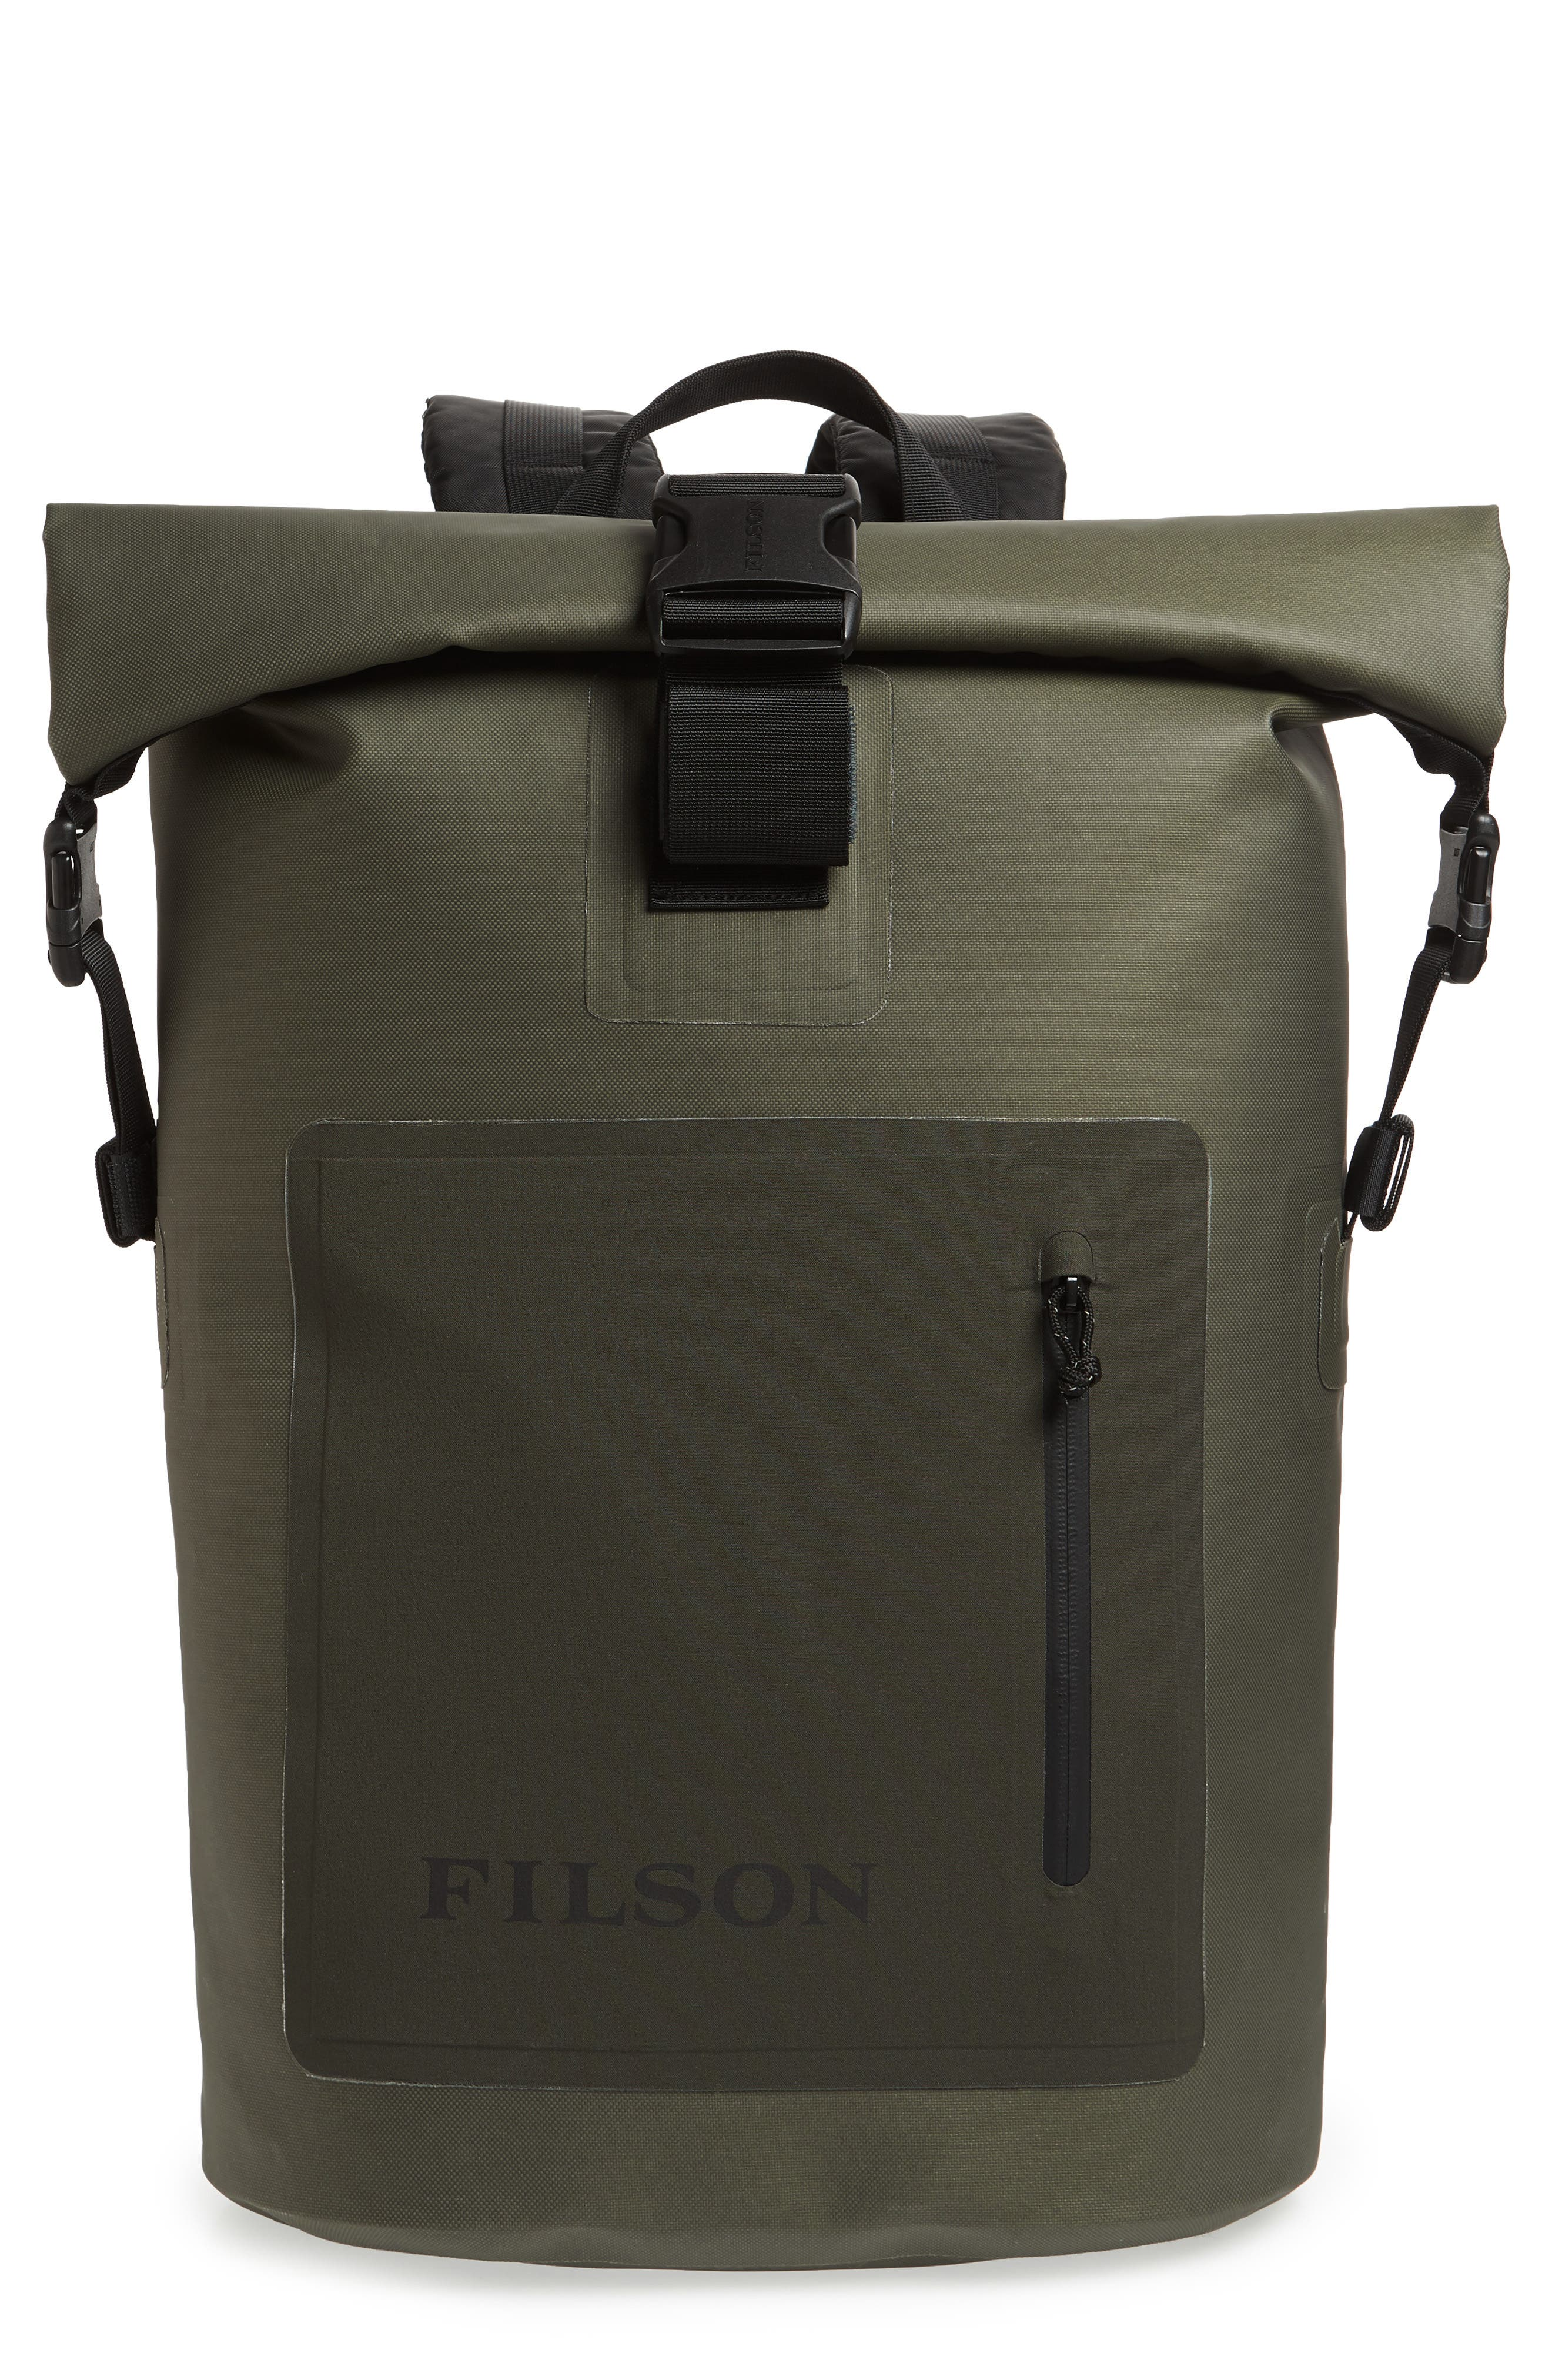 FILSON Dry Waterproof Backpack - Green